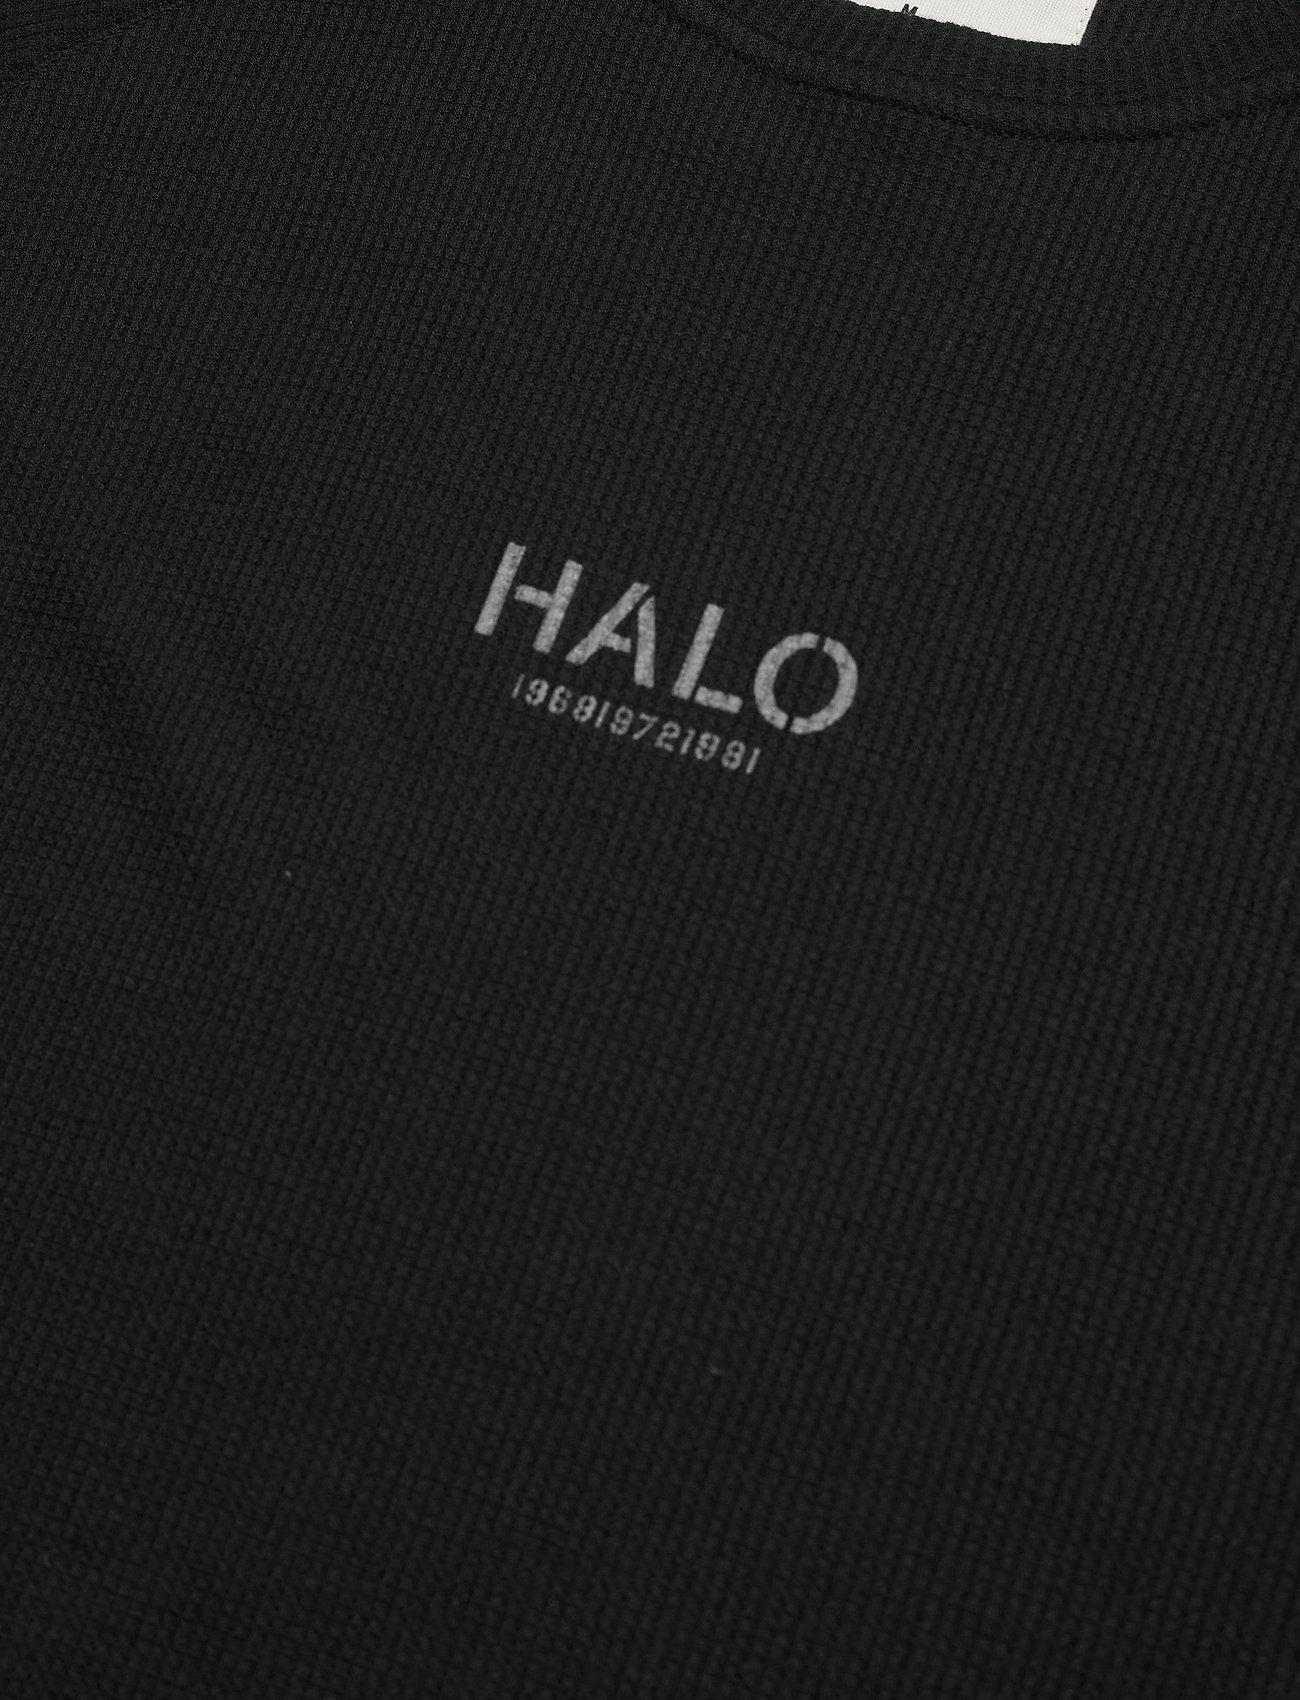 HALO HALO Waffle Tee - T-skjorter BLACK - Menn Klær